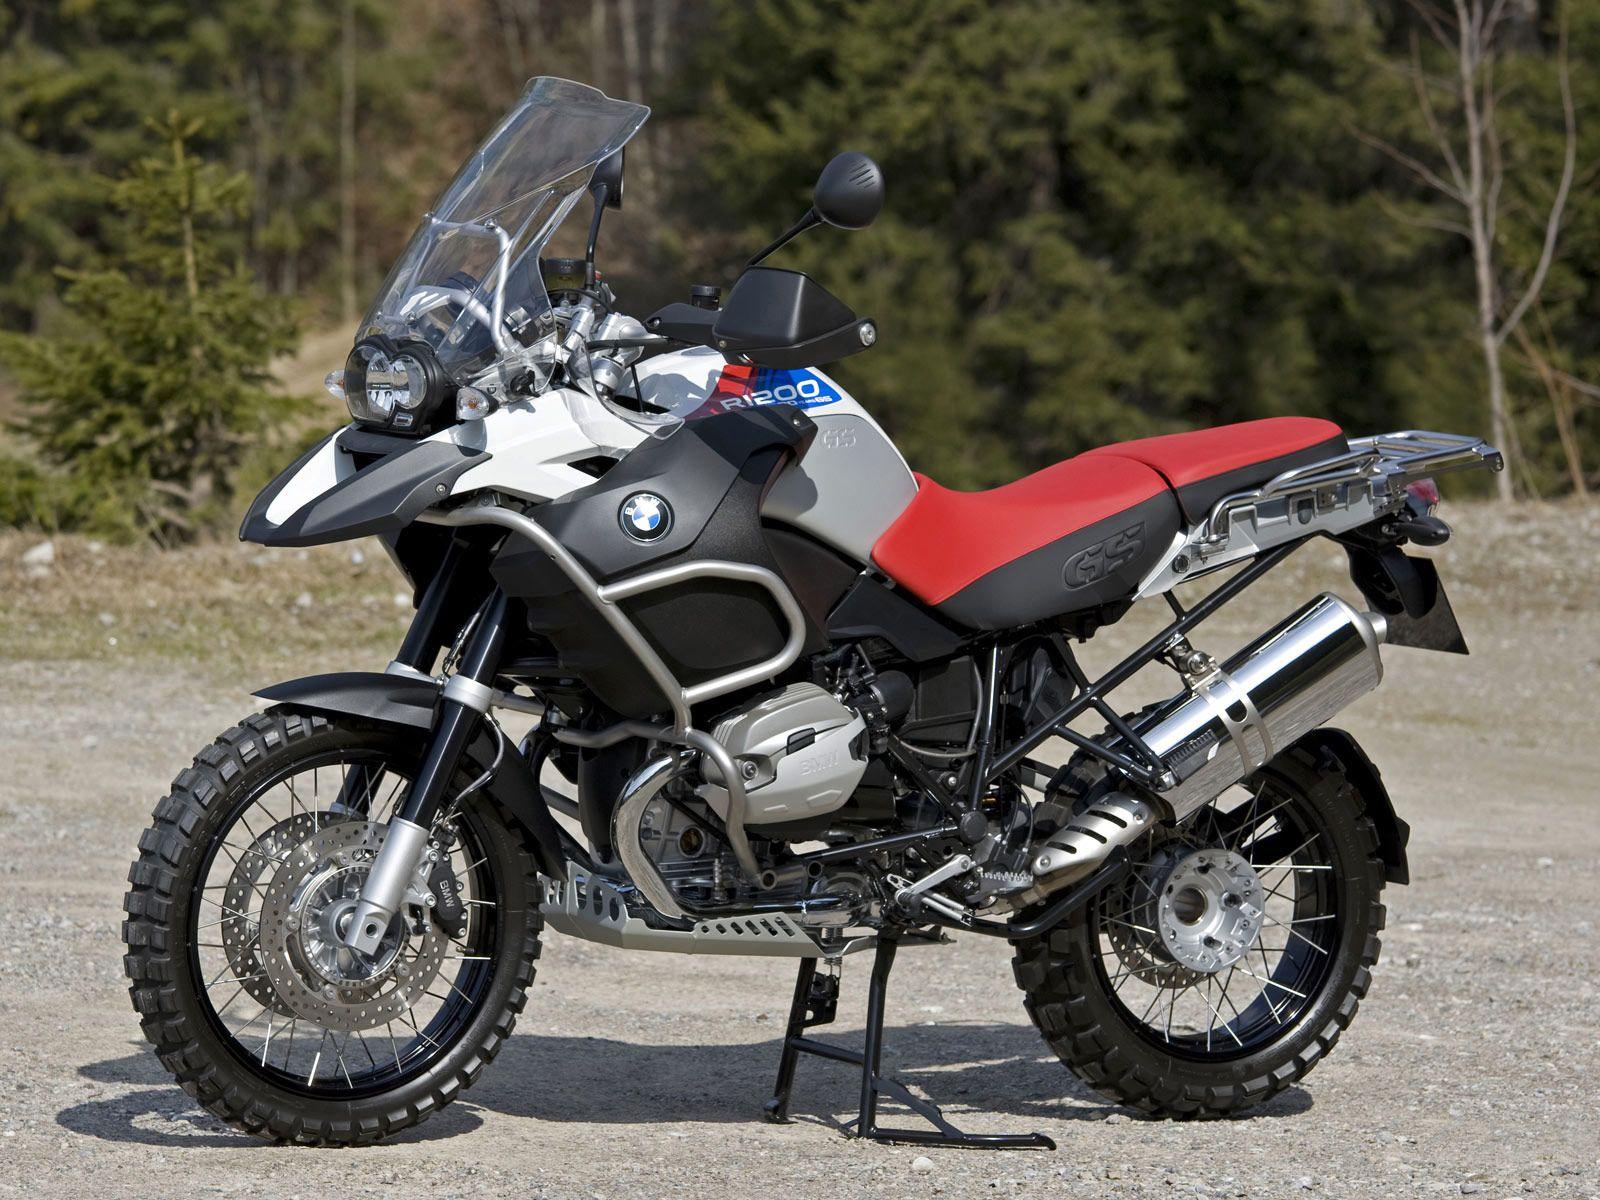 Bmw R1200gs Adventure Bmw R1200gs Adventure Motorcycle